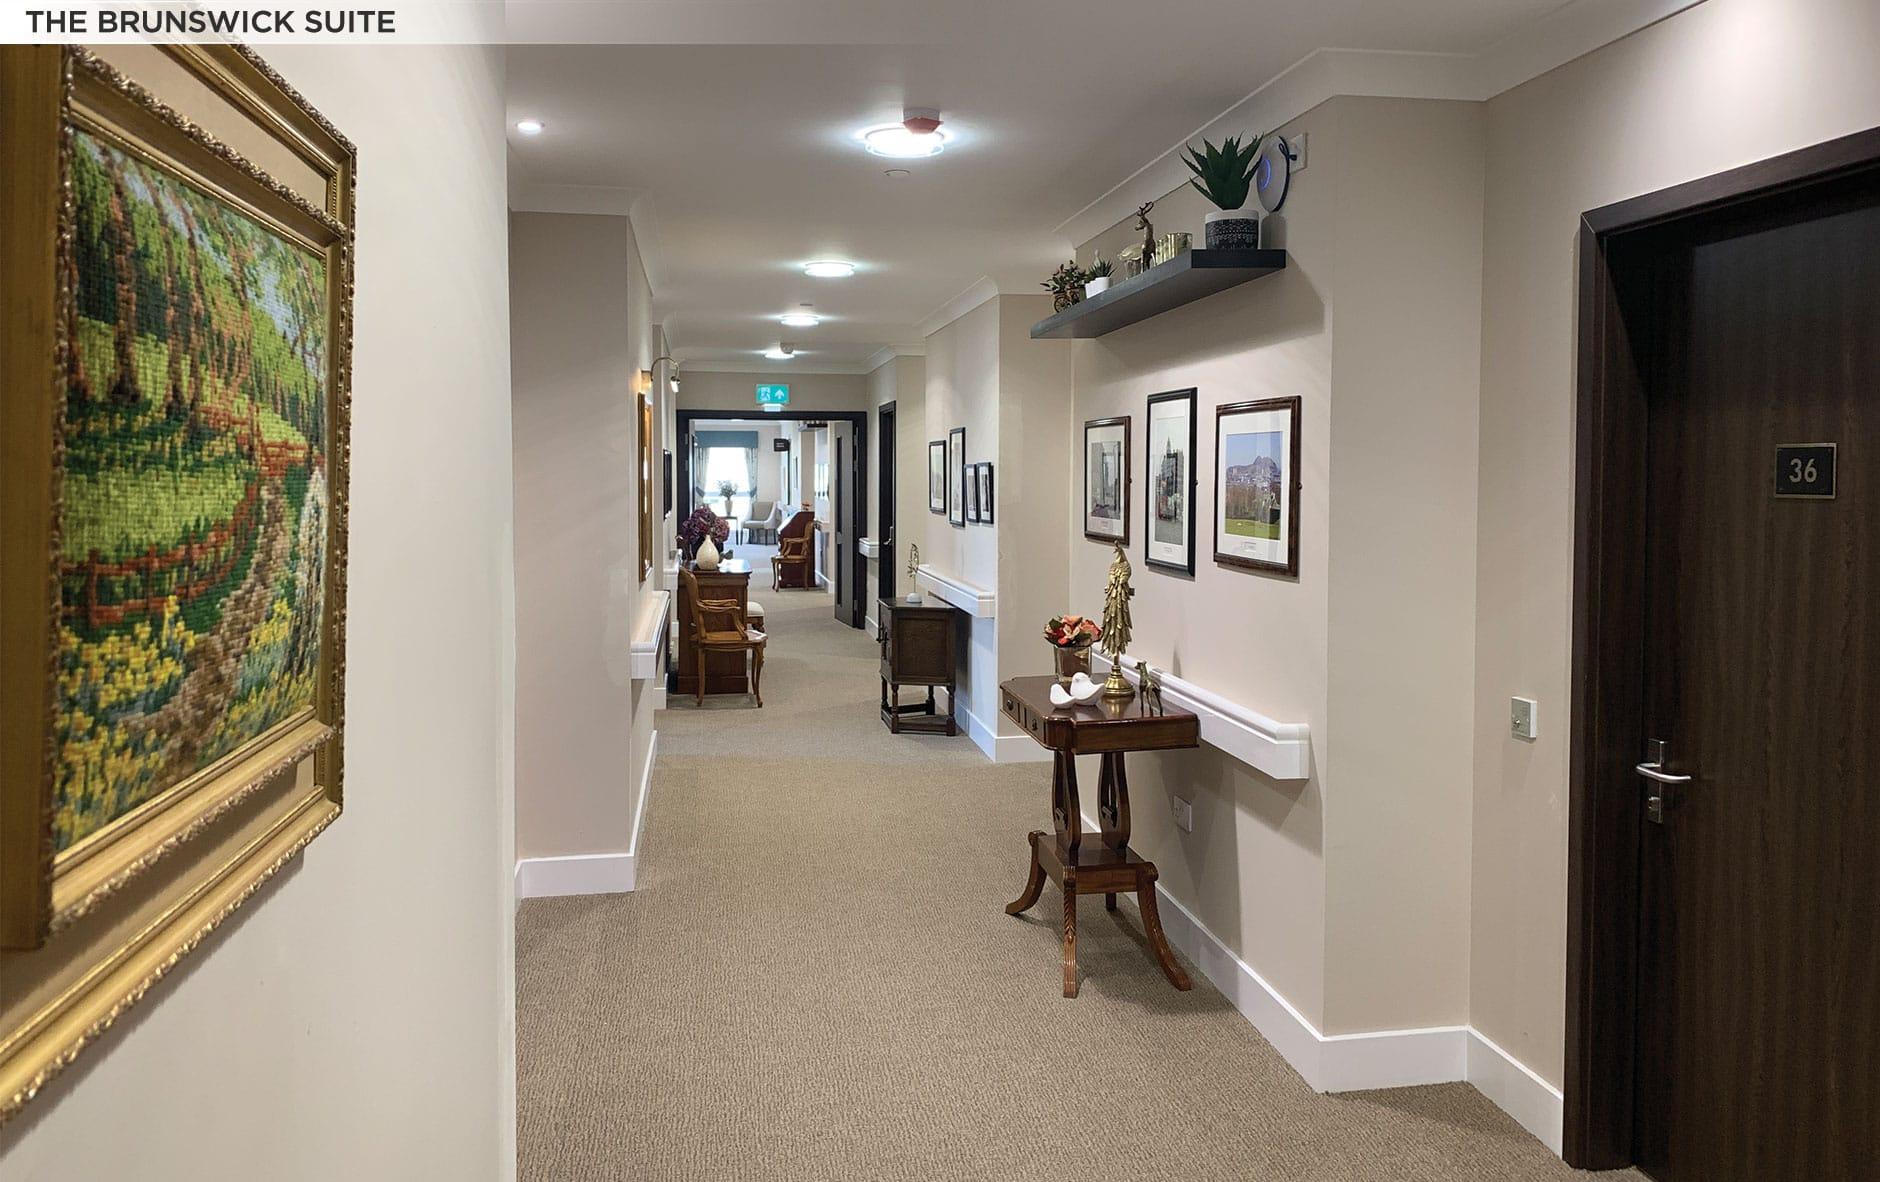 NS-the-brunswick-suite